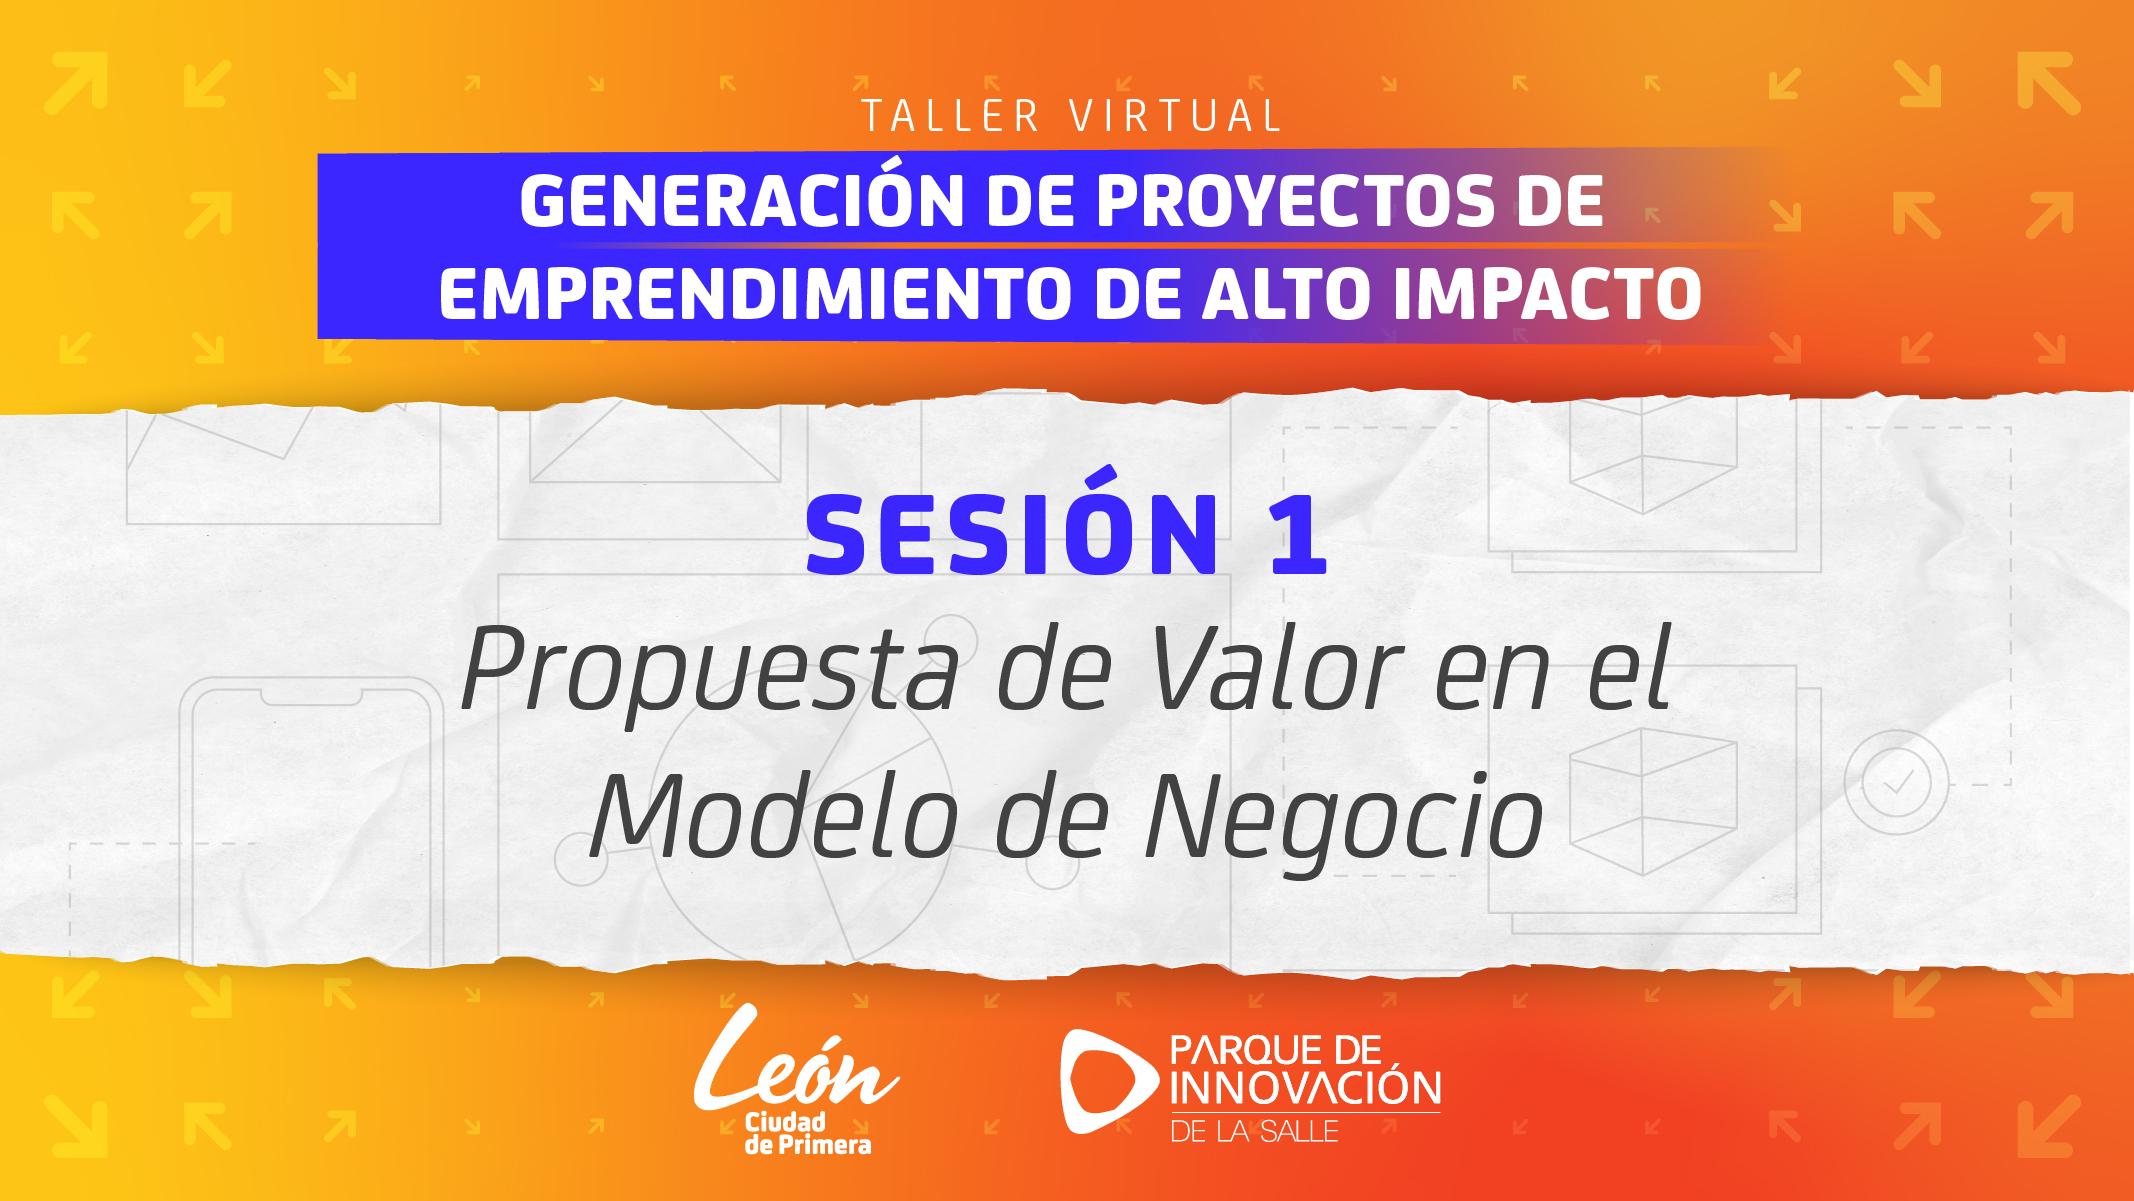 Sesión 1 – Taller de proyectos de emprendimiento de alto impacto